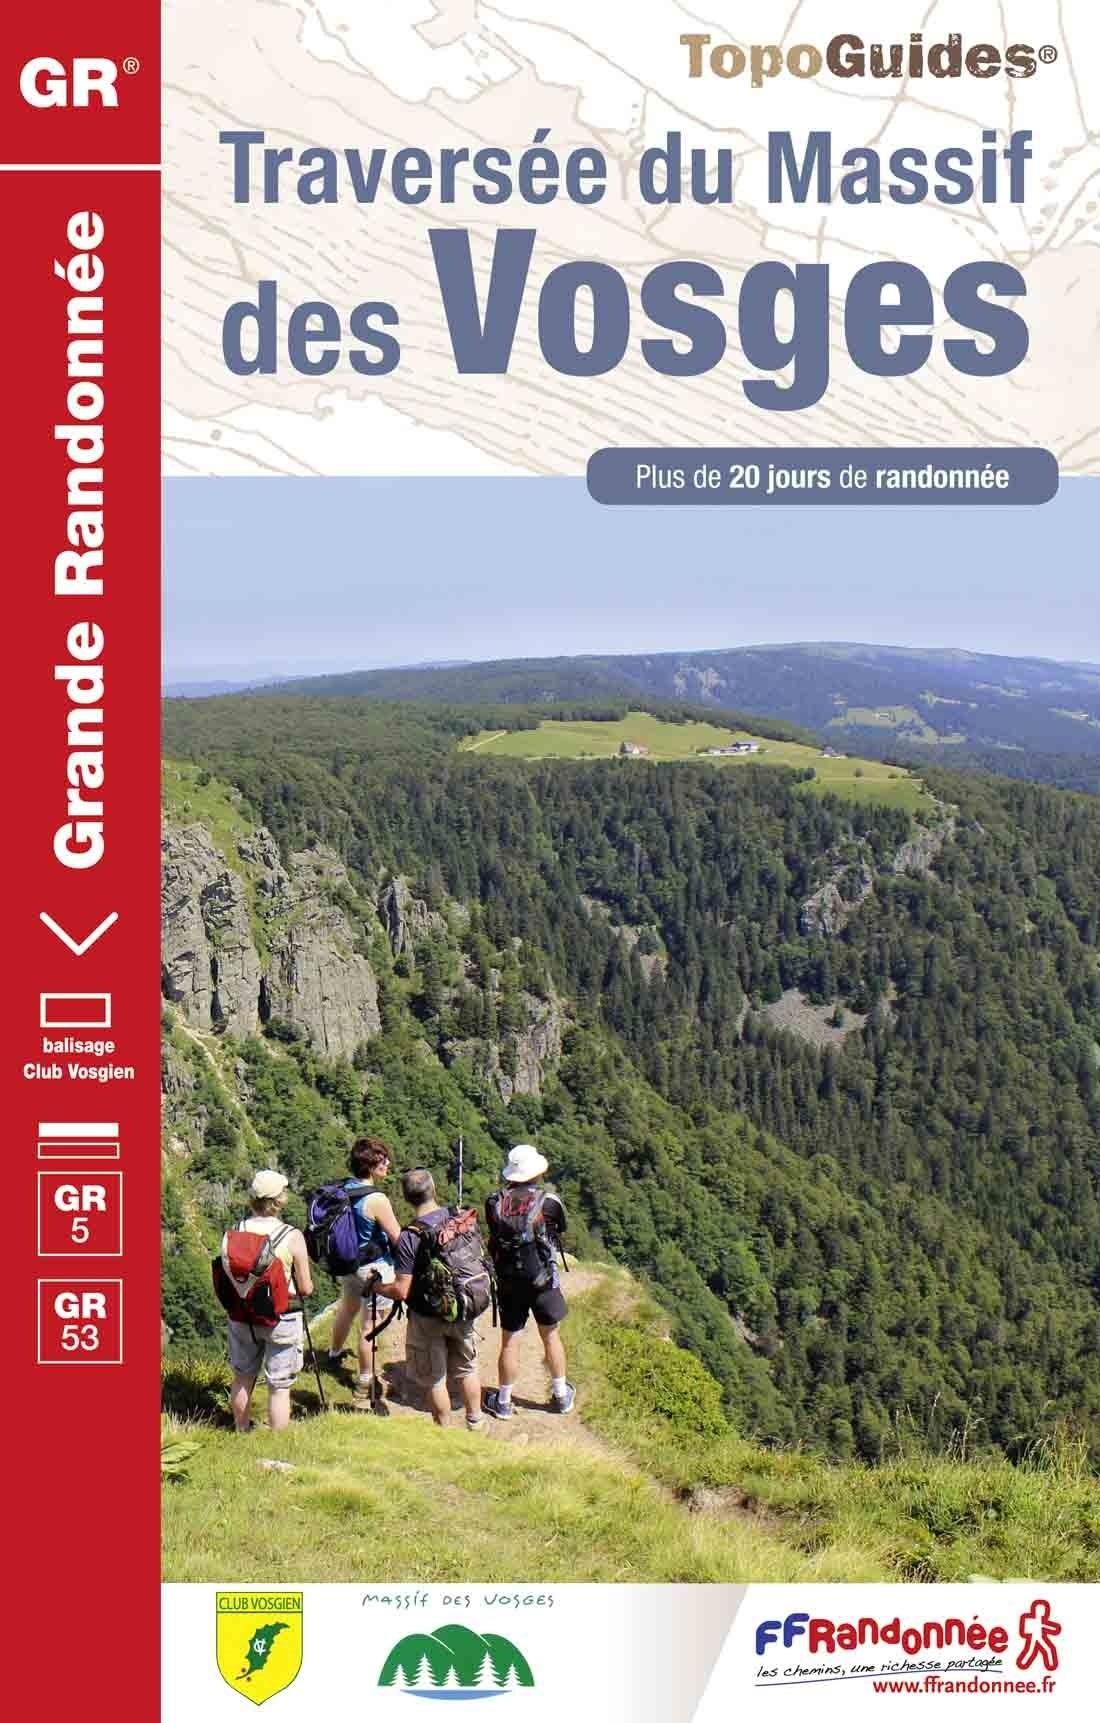 GR-5 | TG502  Crête des Vosges | wandelgids GR5 9782751409790  FFRP Topoguides  Lopen naar Rome, Wandelgidsen Vogezen